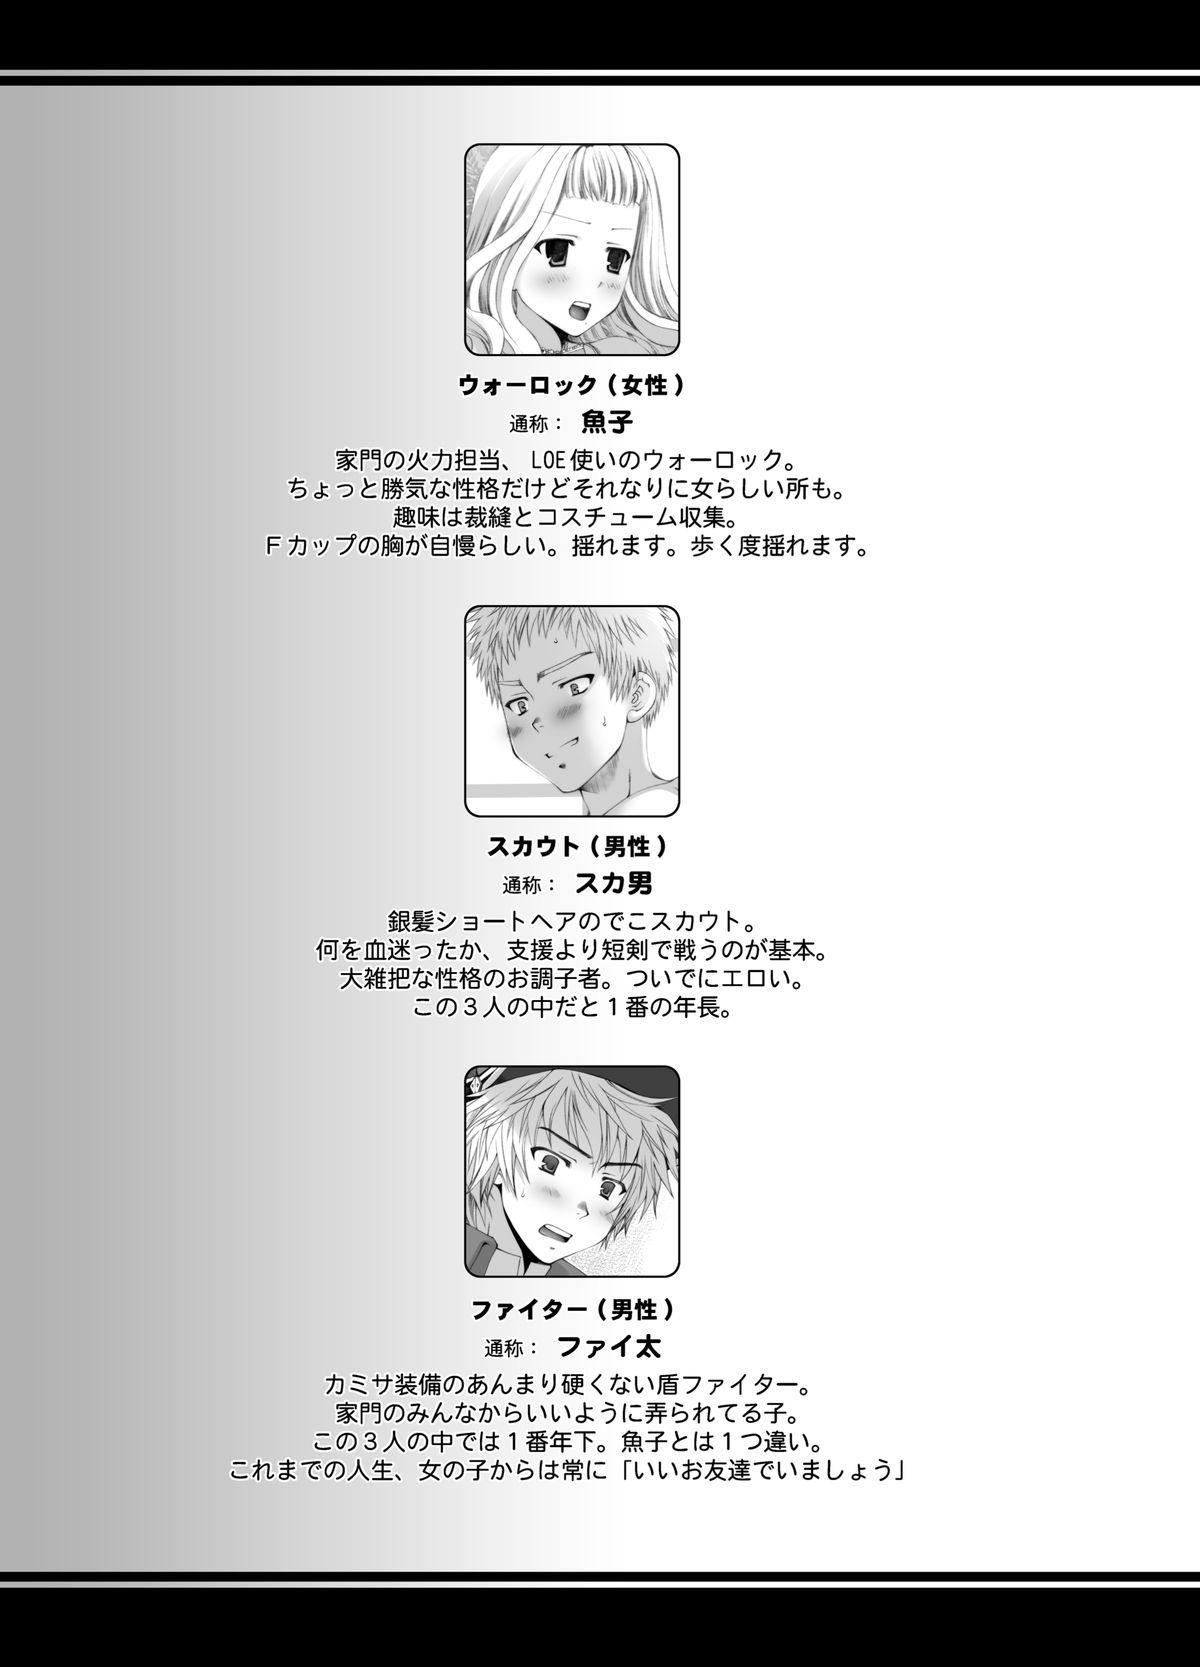 Yawaraka Noukou Osaka na Purin Milk Zouryou 3